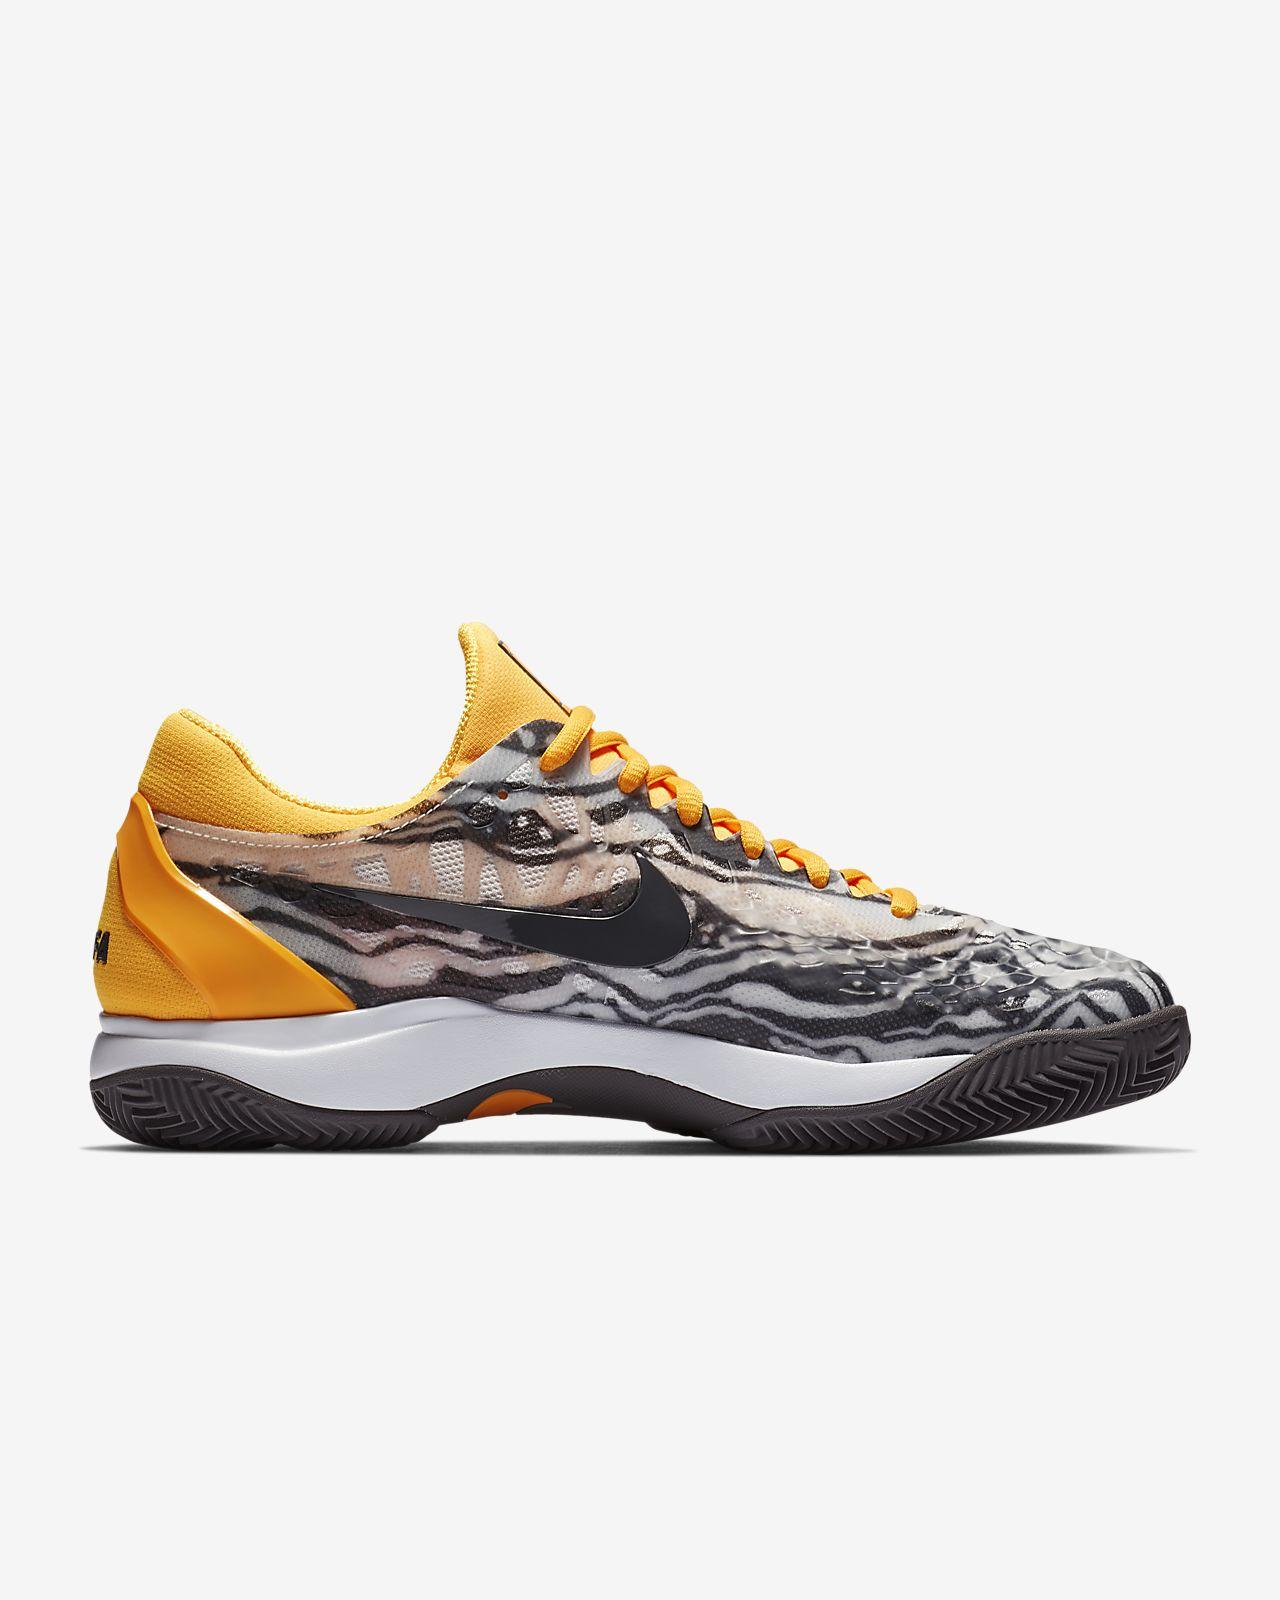 new product 59d70 cbfbc Chaussure de tennis Nike Zoom Cage 3 Clay pour Homme. Nike.com CA